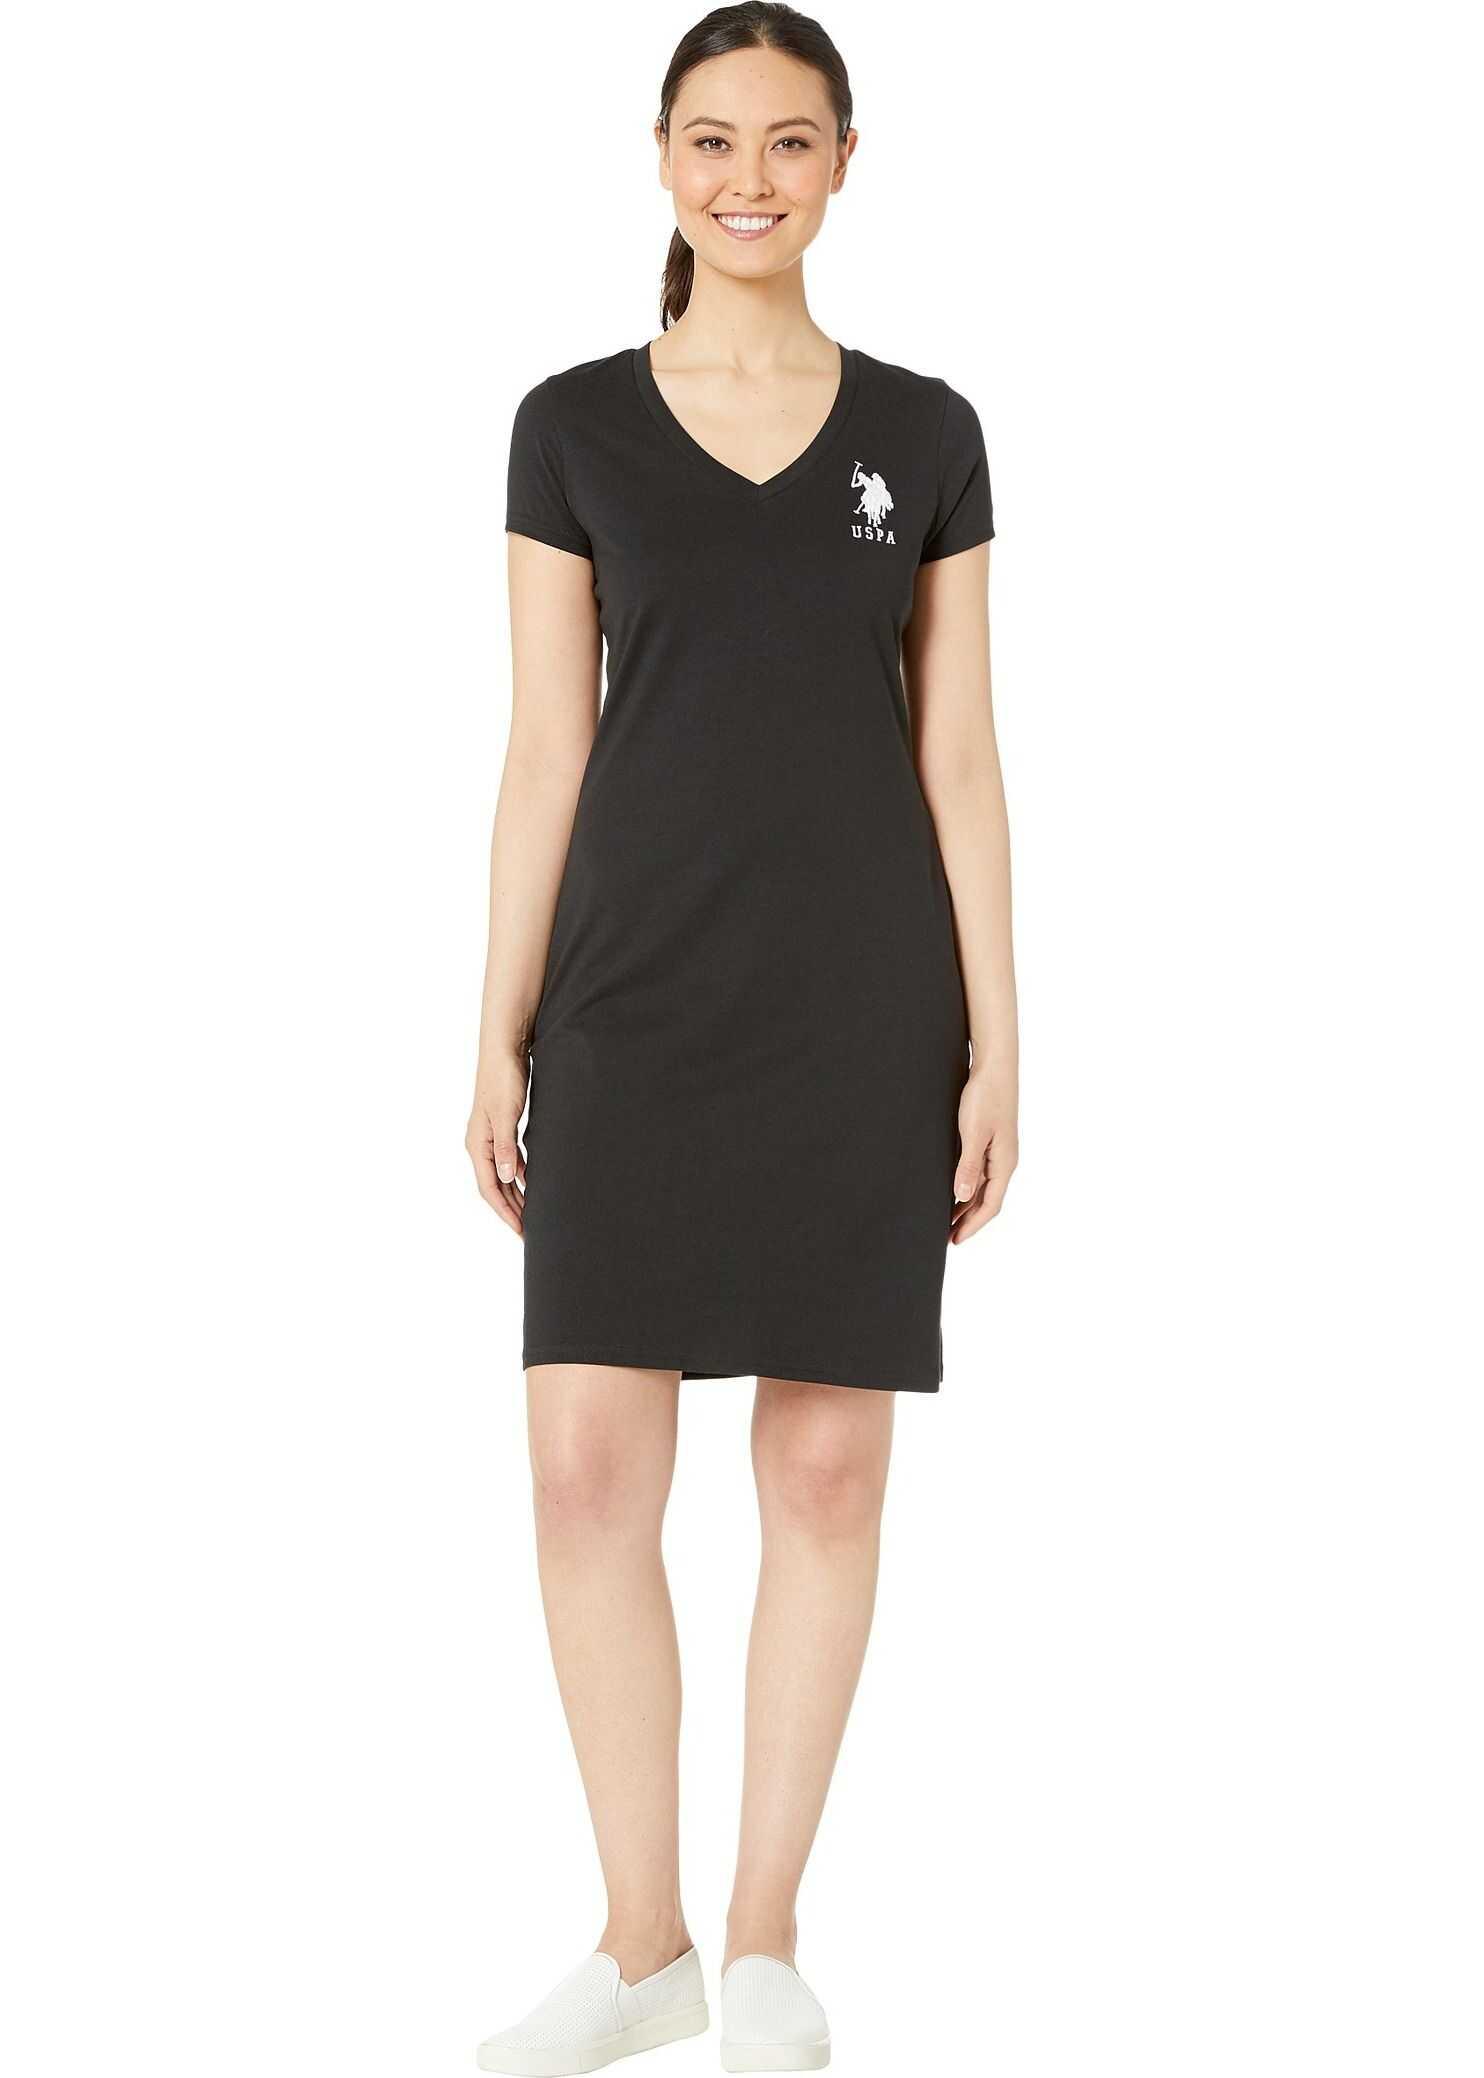 U.S. POLO ASSN. Sneaker Dress Anthracite